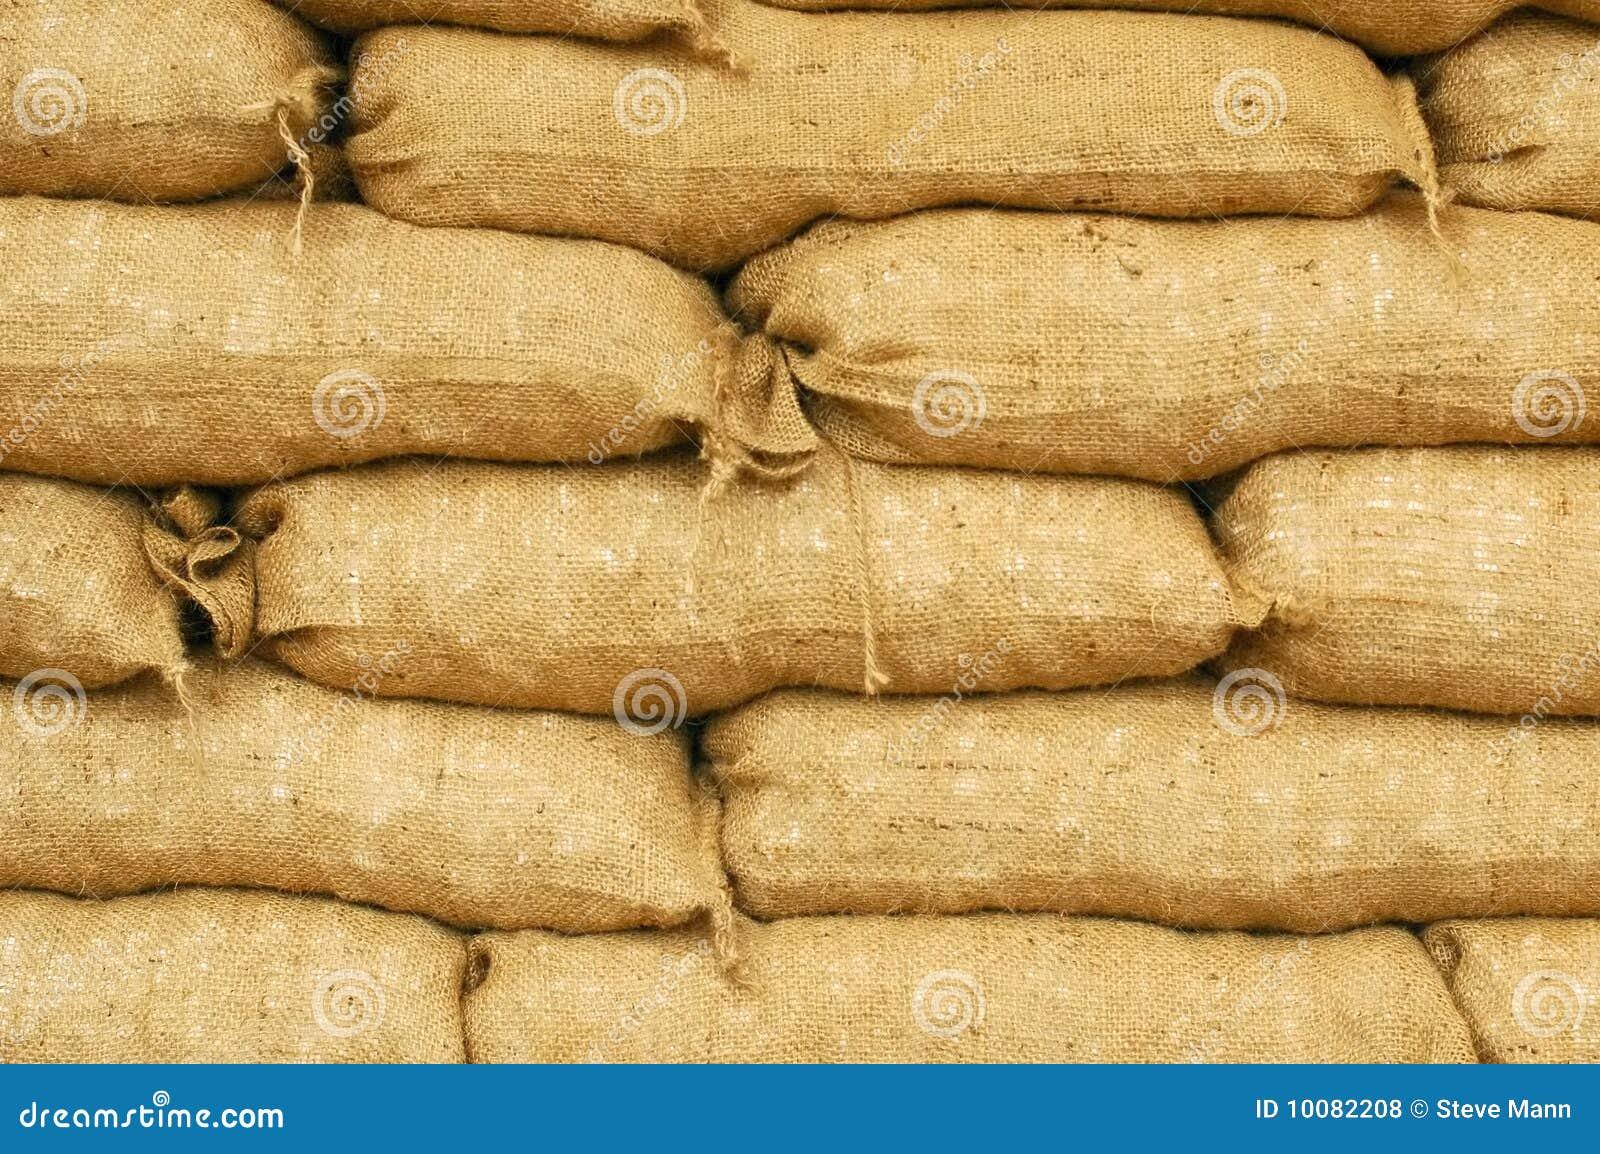 sacs de sable photo stock image du protection inondation 10082208. Black Bedroom Furniture Sets. Home Design Ideas